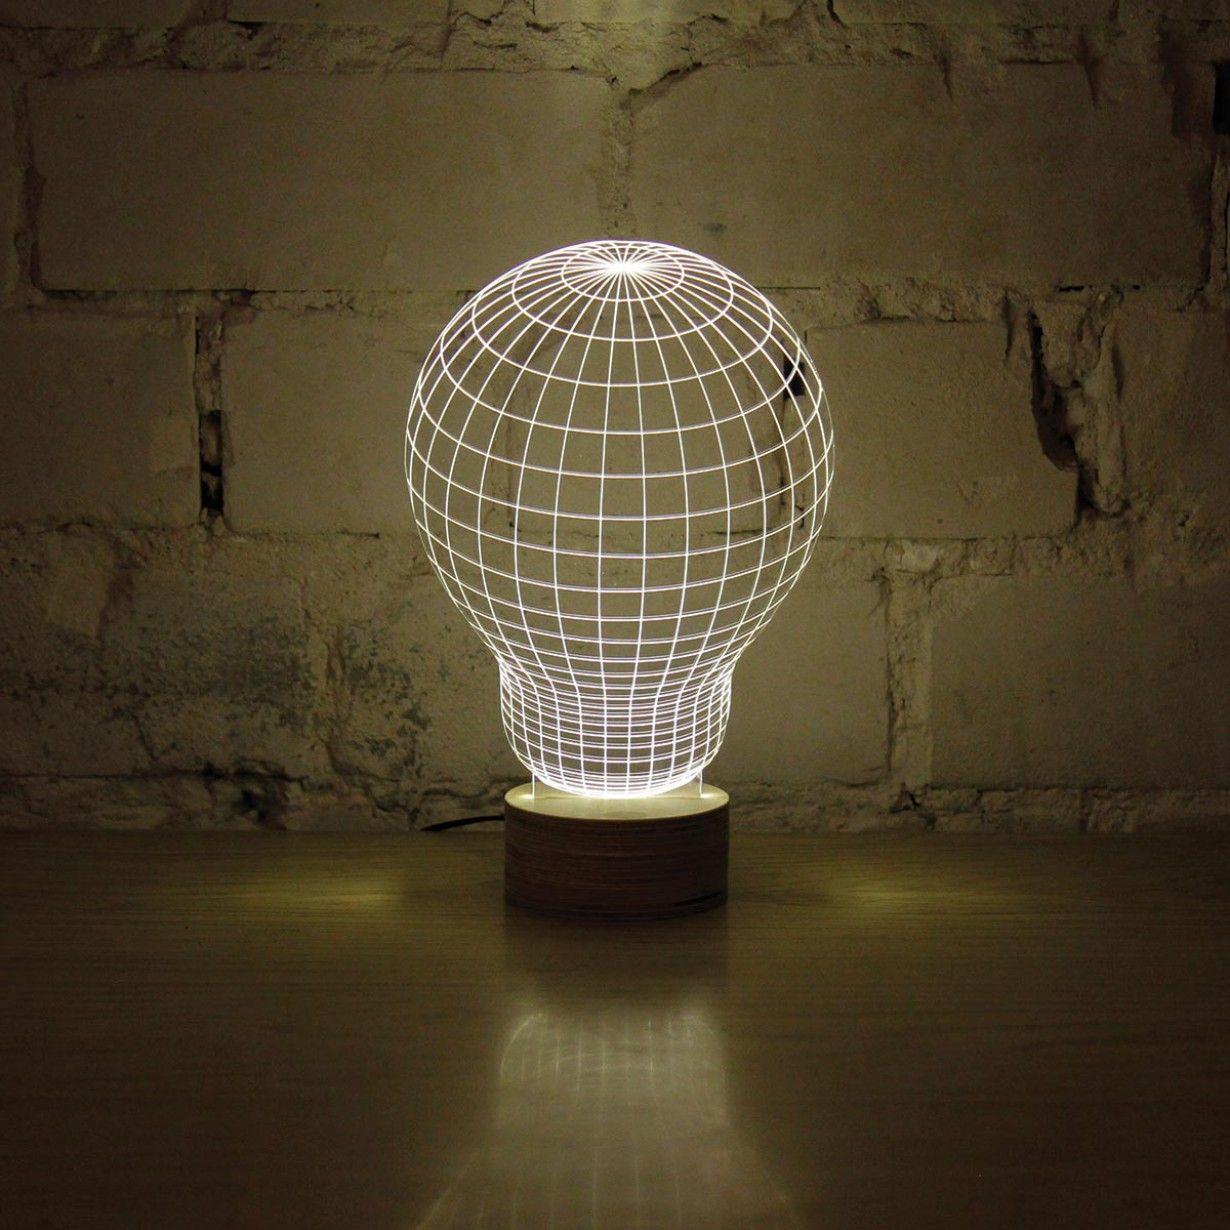 Bulbing Gluhbirne Led Leuchte Mit 3d Effekt Fablife Led Leuchten Led Gluhbirne